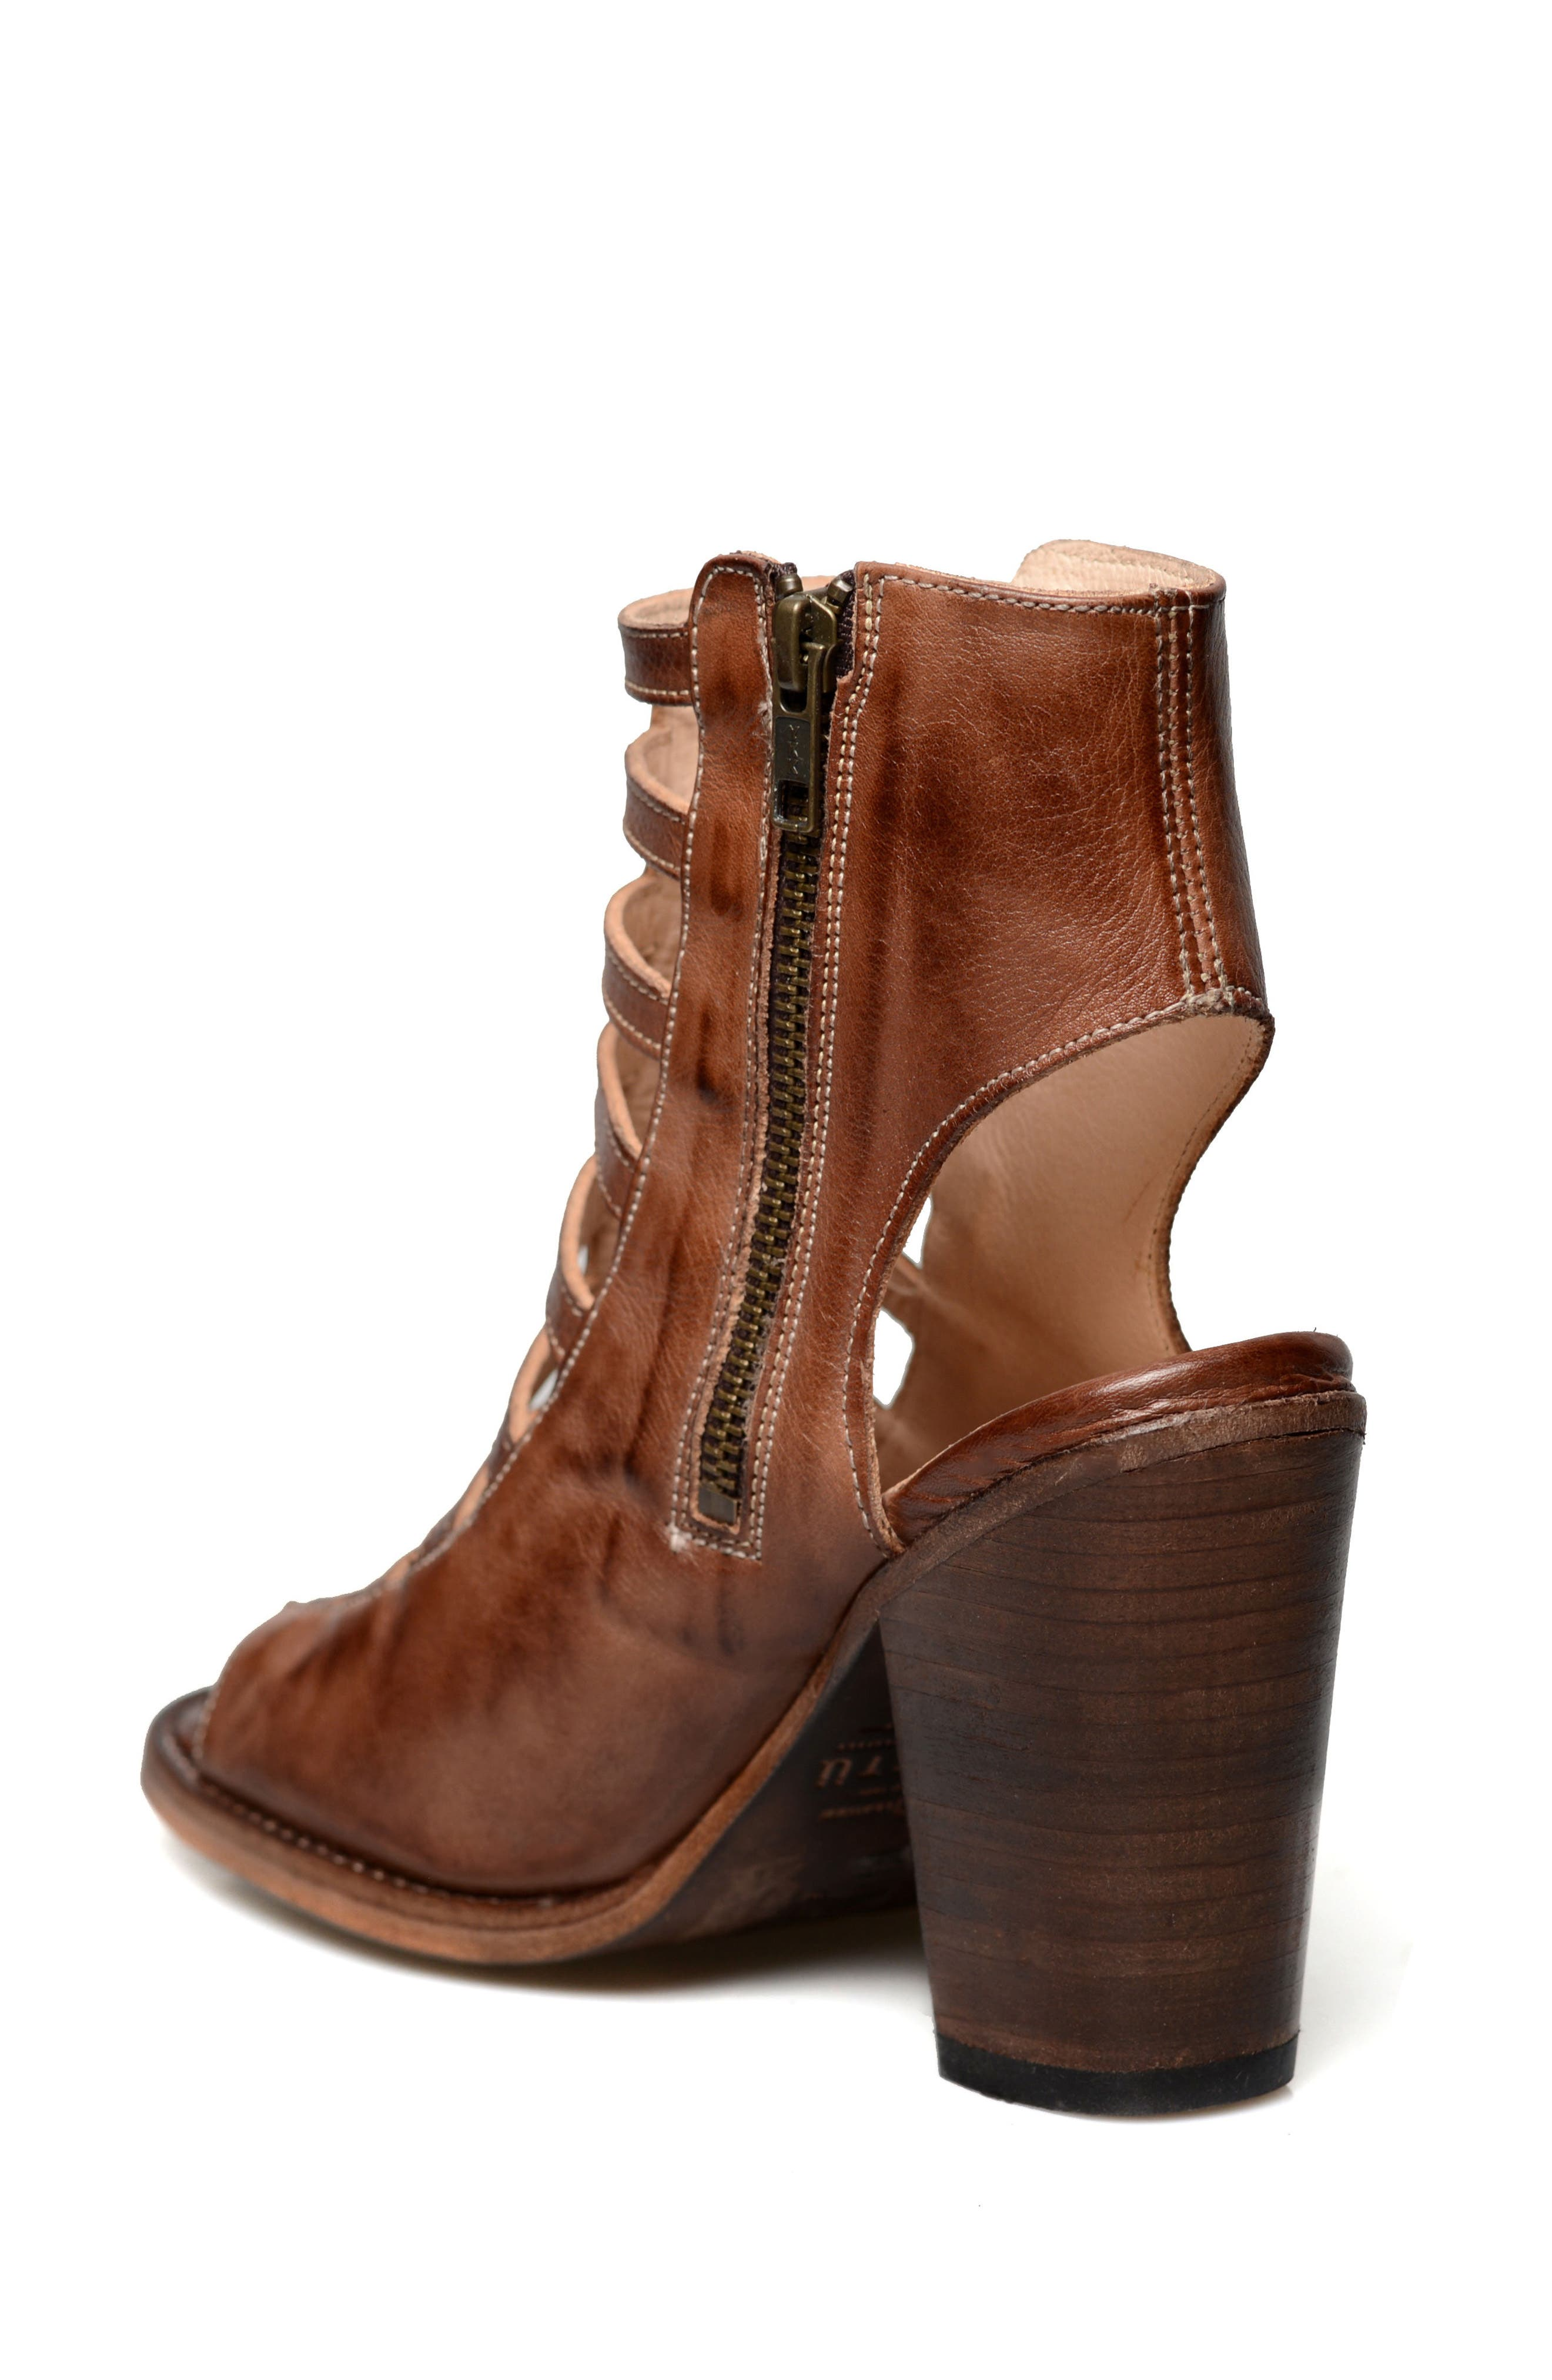 Occam Caged Sandal,                             Alternate thumbnail 2, color,                             Teak Rustic Leather